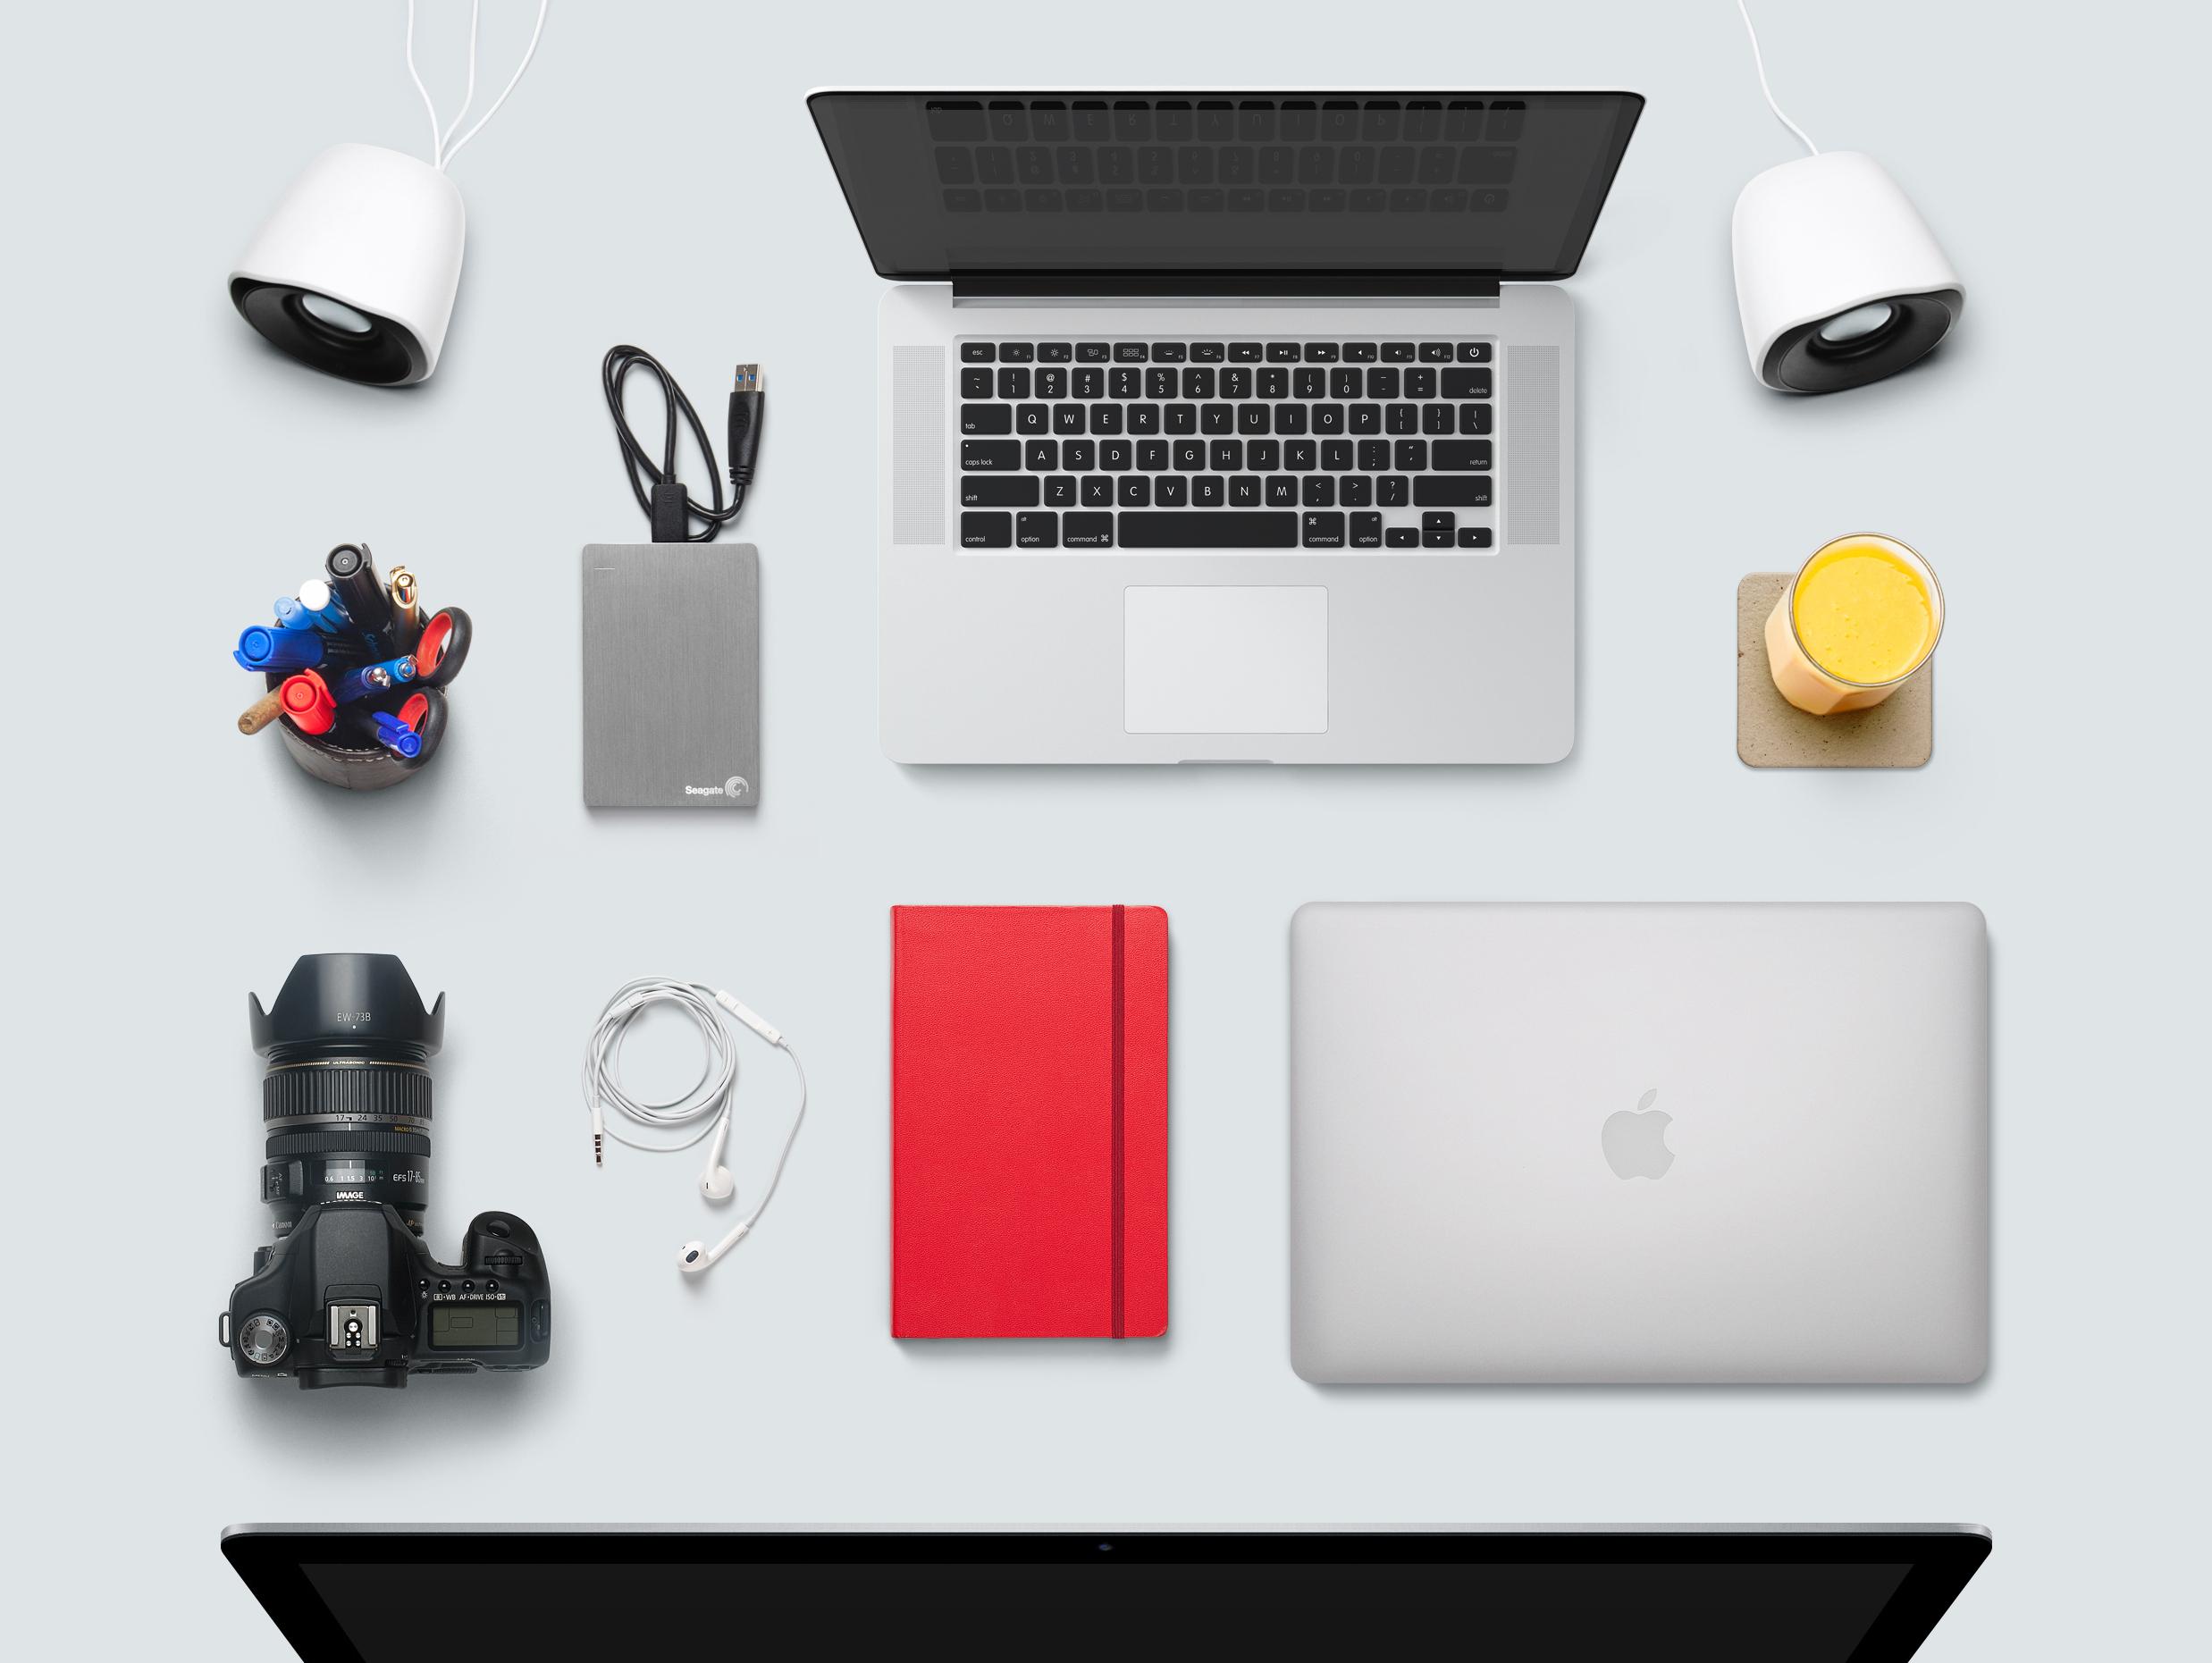 ipadiphone6imac一体机一套苹果场景高档v苹果素材设备psd晨尔天鹅绒连裤袜图片